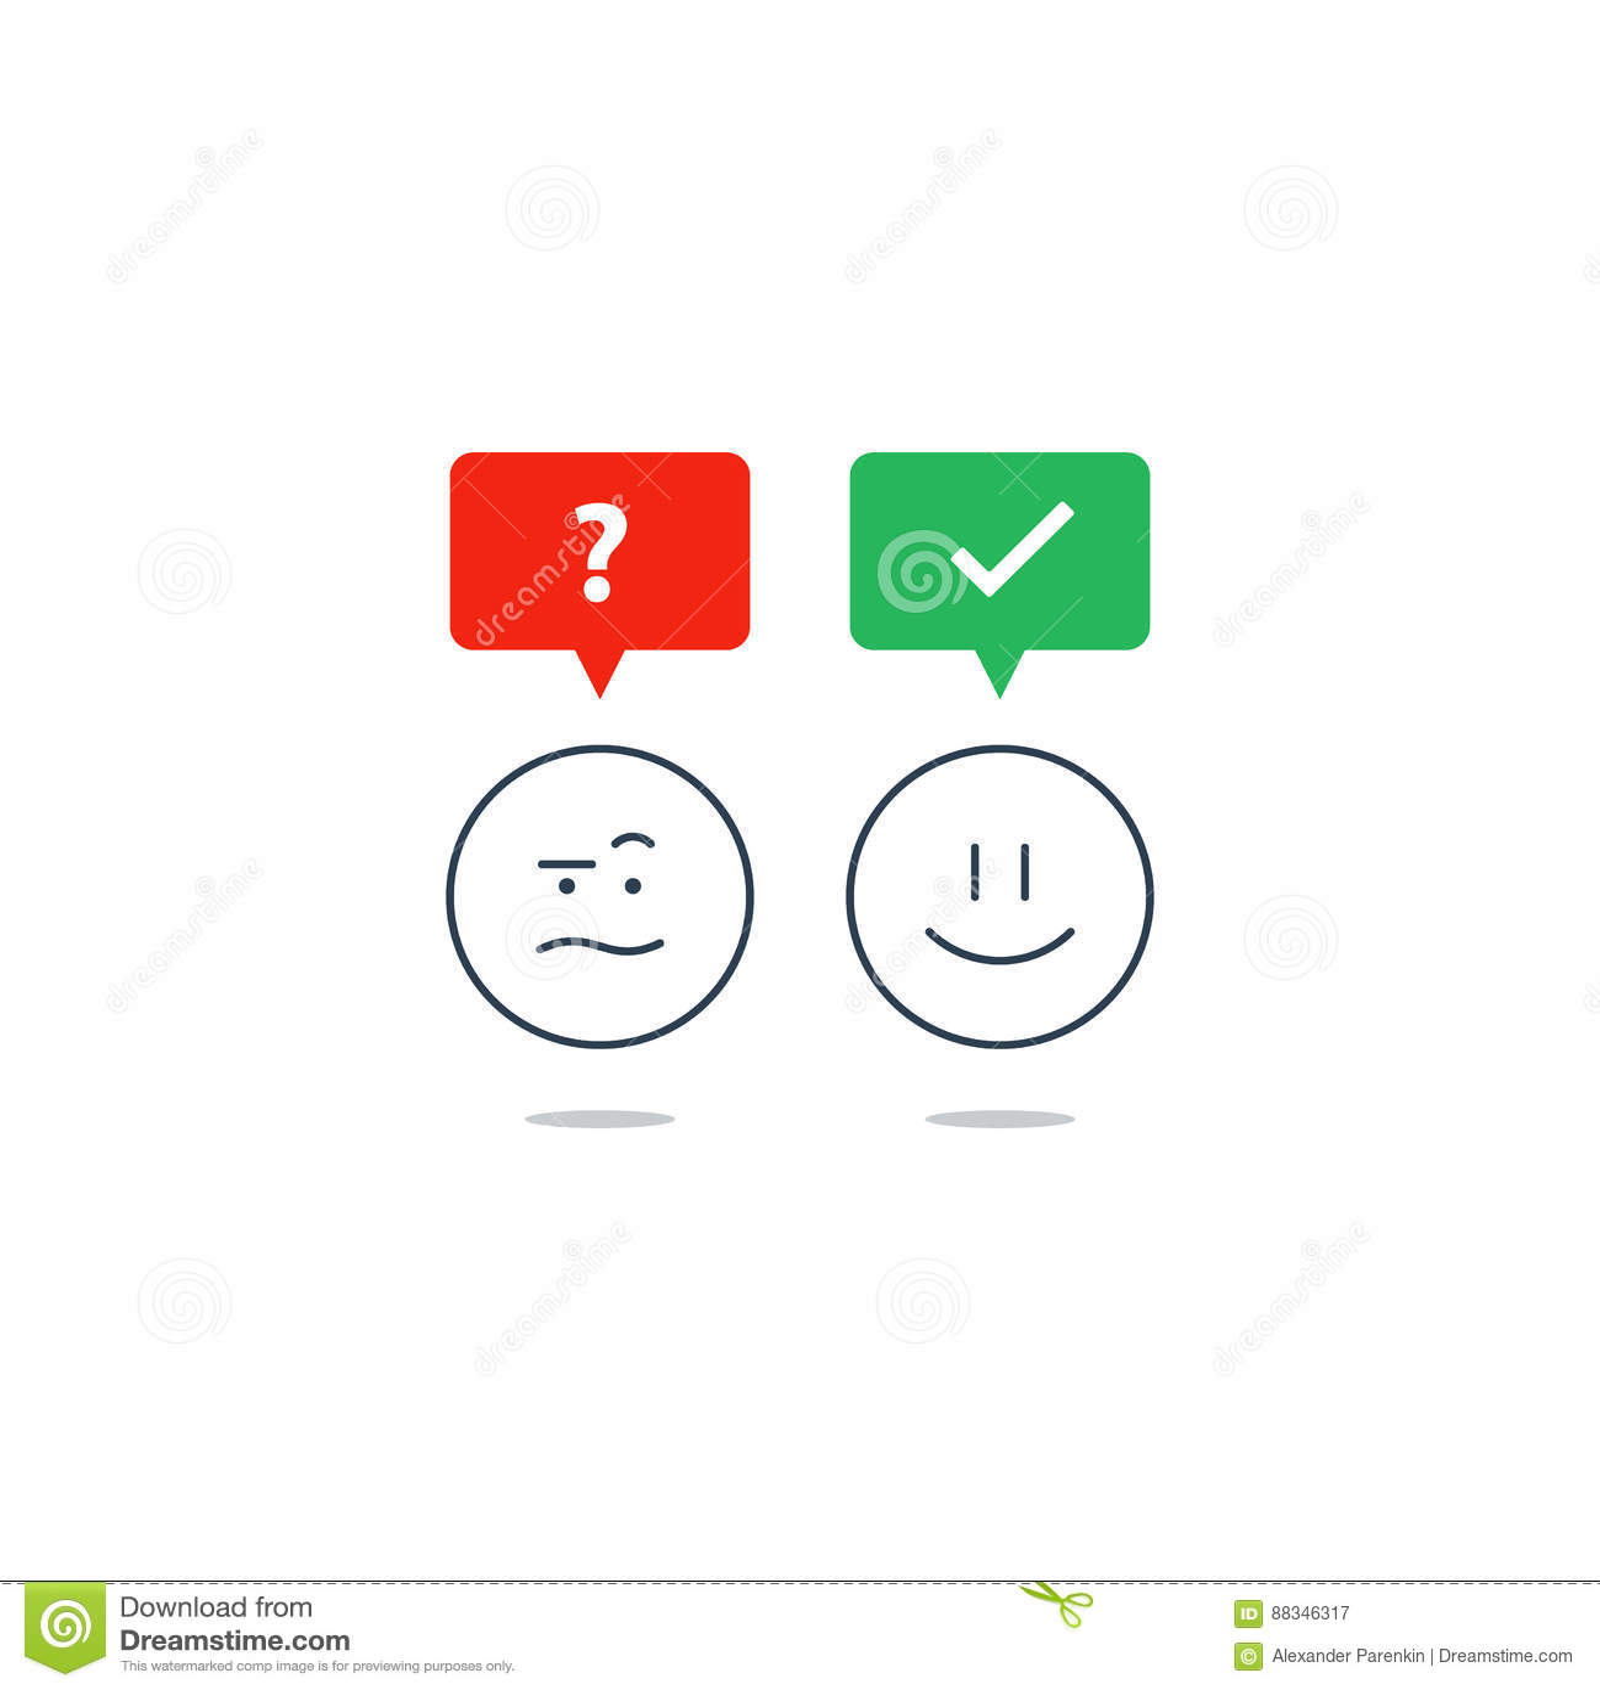 Opposite Emotions, Smile Emoji, Sad Icon, Customer Services